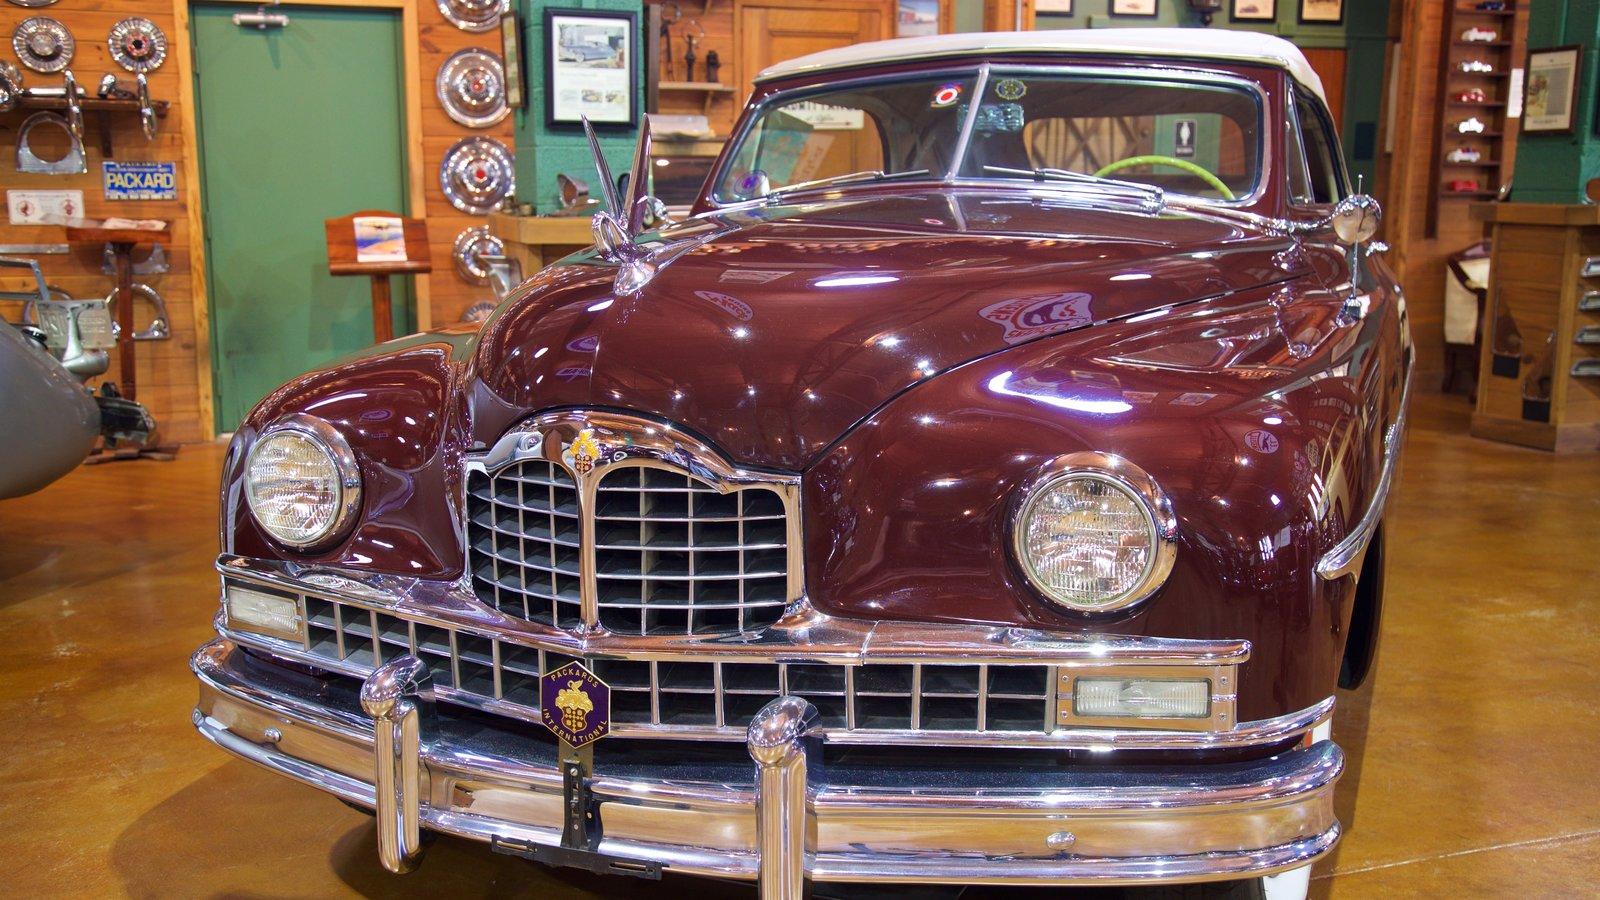 Fort Lauderdale Antique Car Museum mostrando elementos de patrimônio e vistas internas